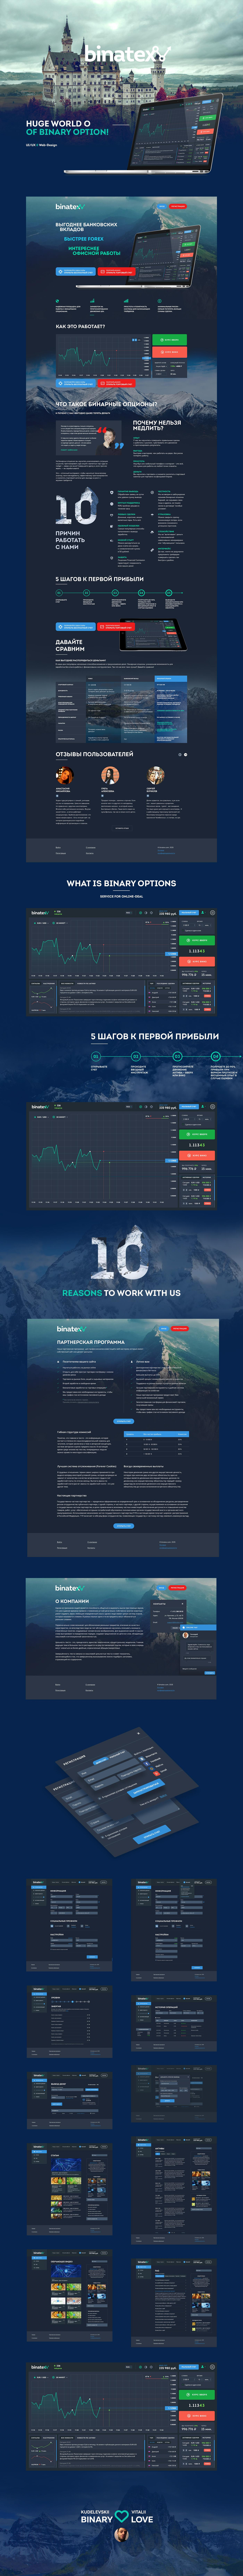 Binary option website design